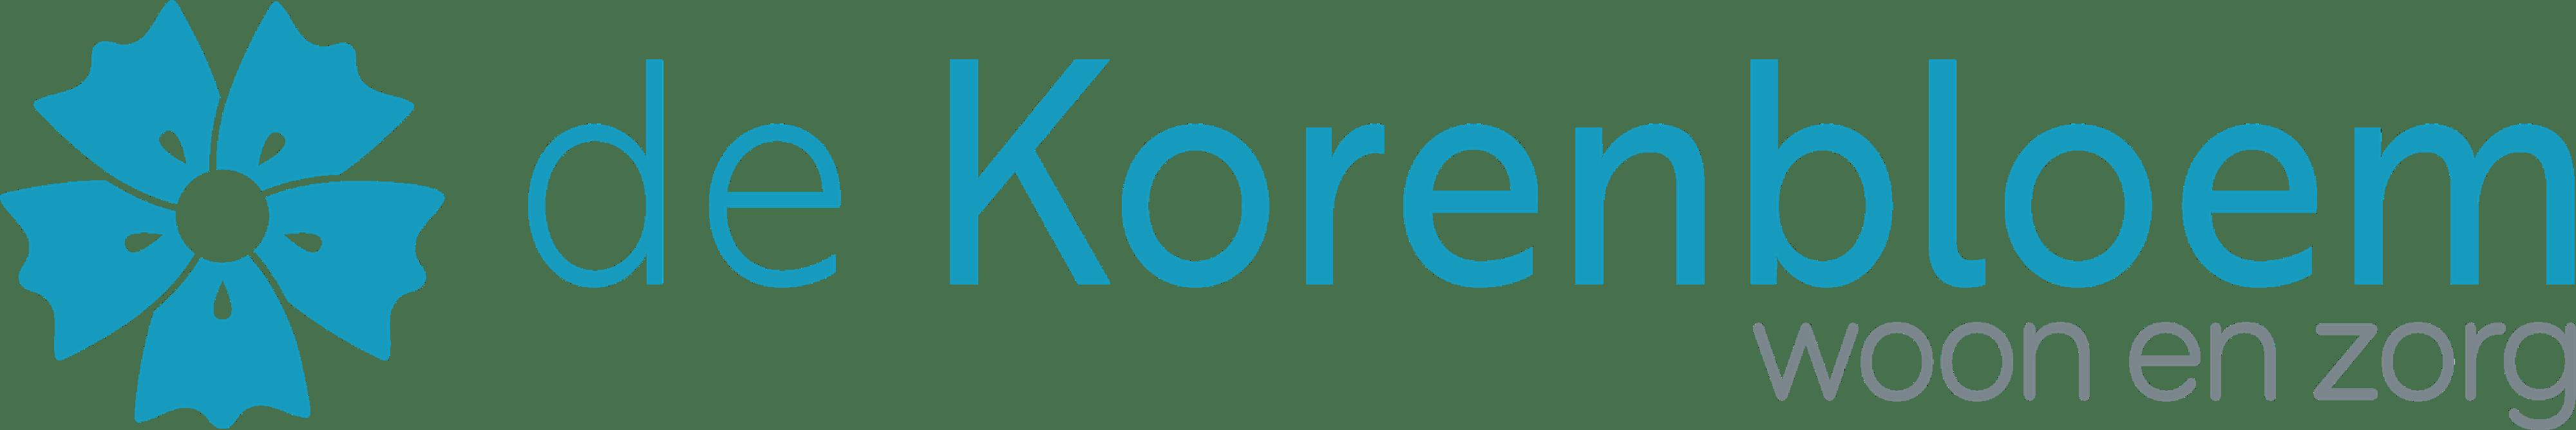 de Korenbloem logo